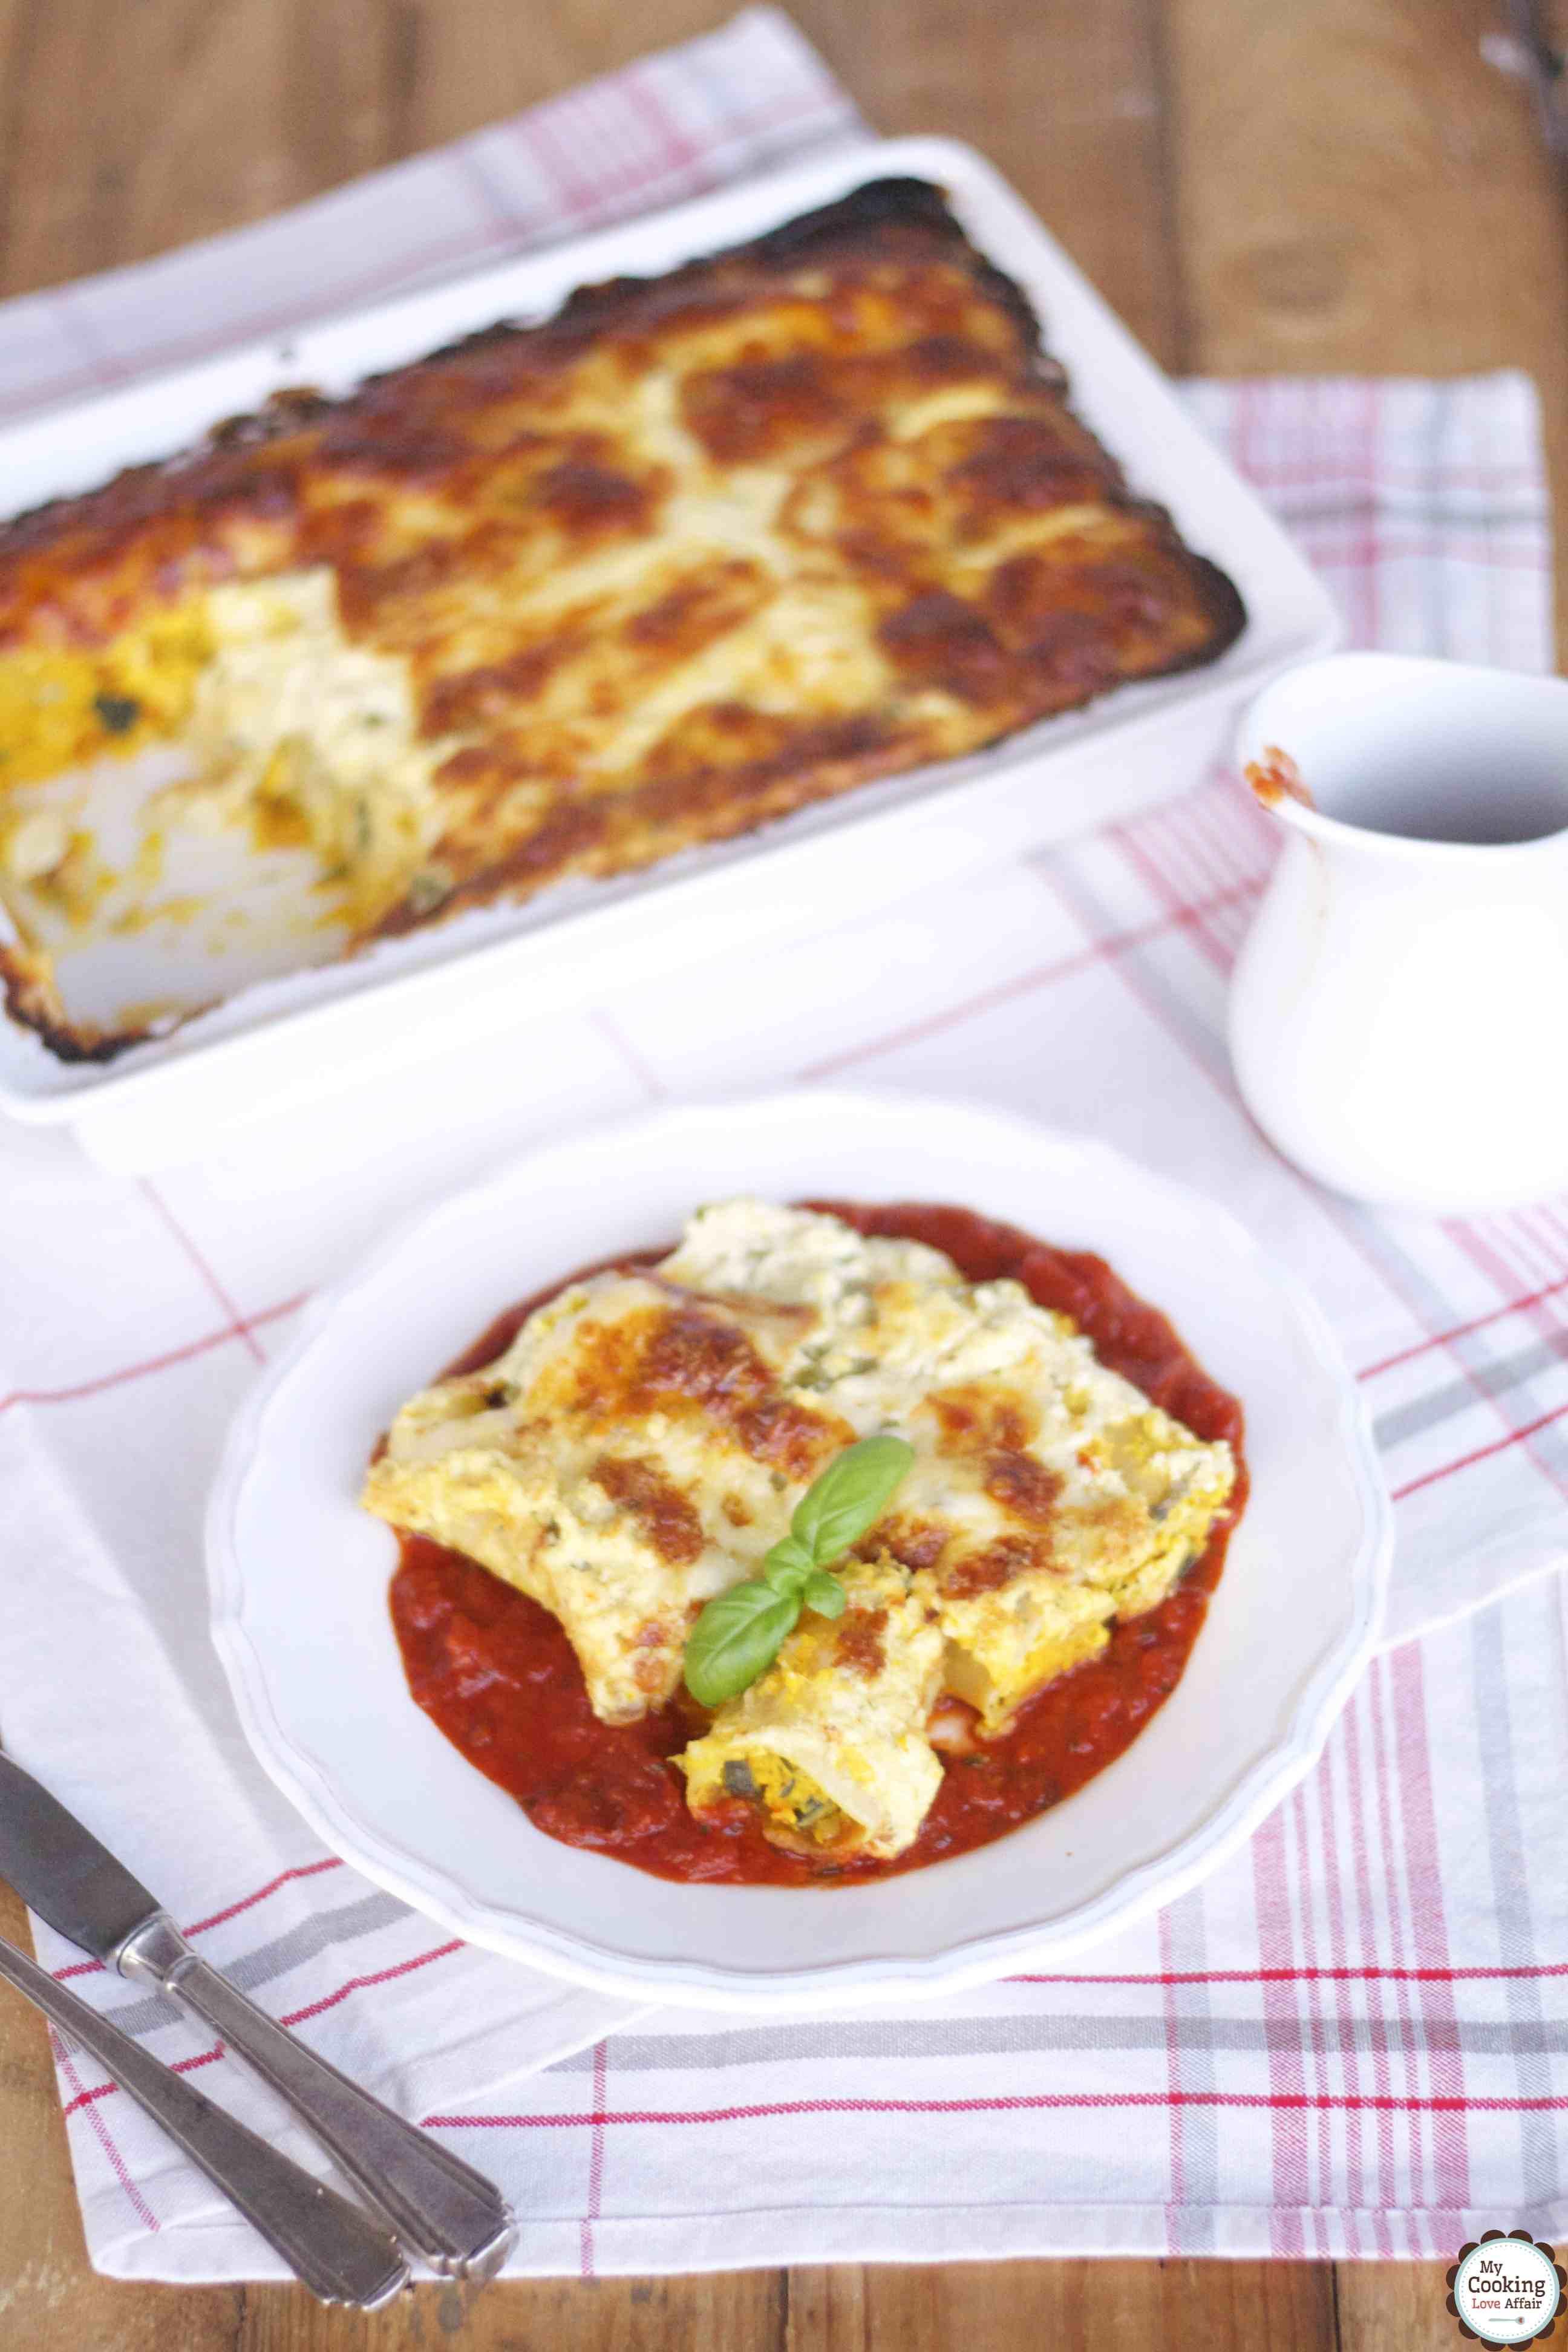 Kürbis-Ricotta-Cannelloni mit Tomatensoße